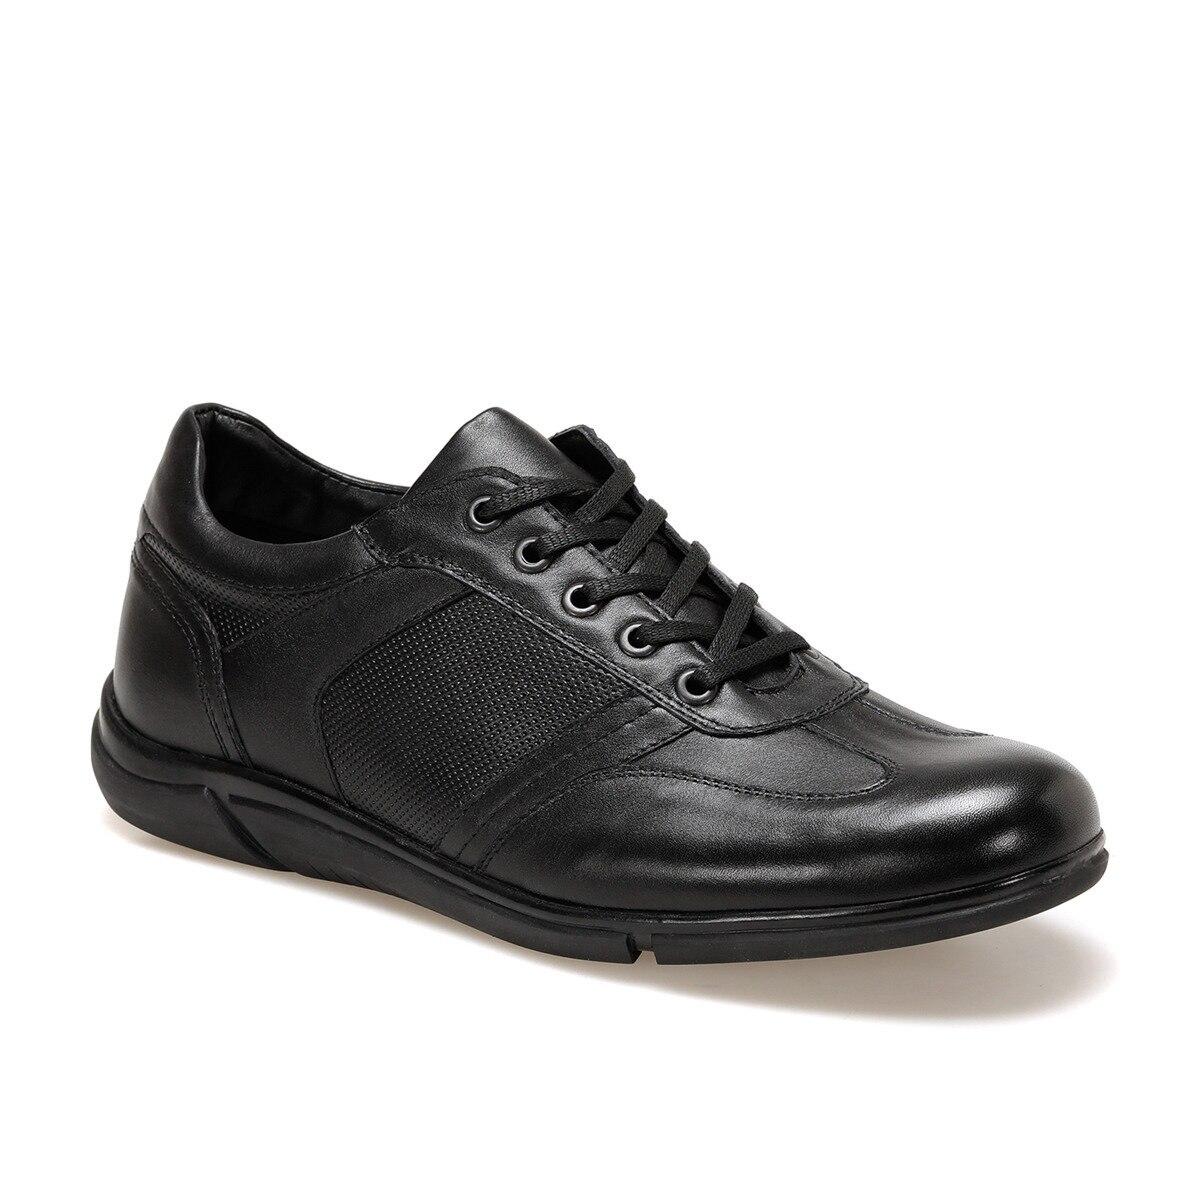 FLO GBS11 Black Men Casual Shoes Oxide